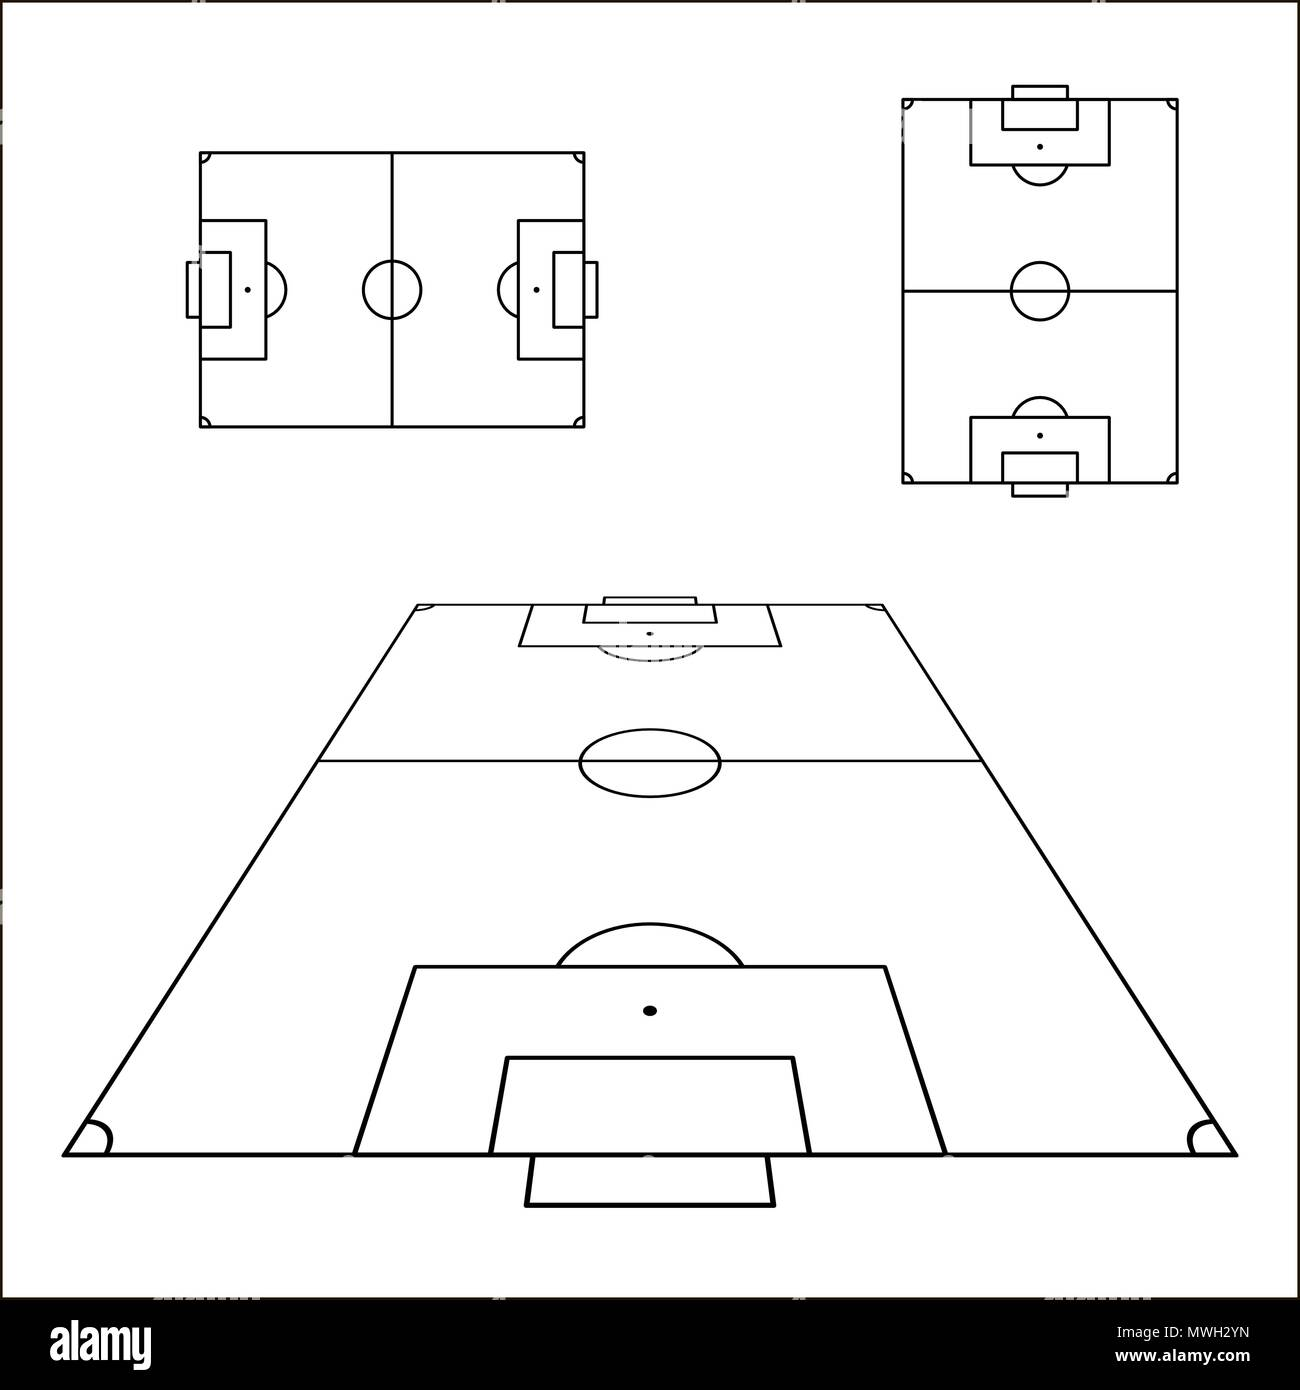 Soccer Field Template | Sketch Of Soccer Fields Set Football Field Design Element Soccer